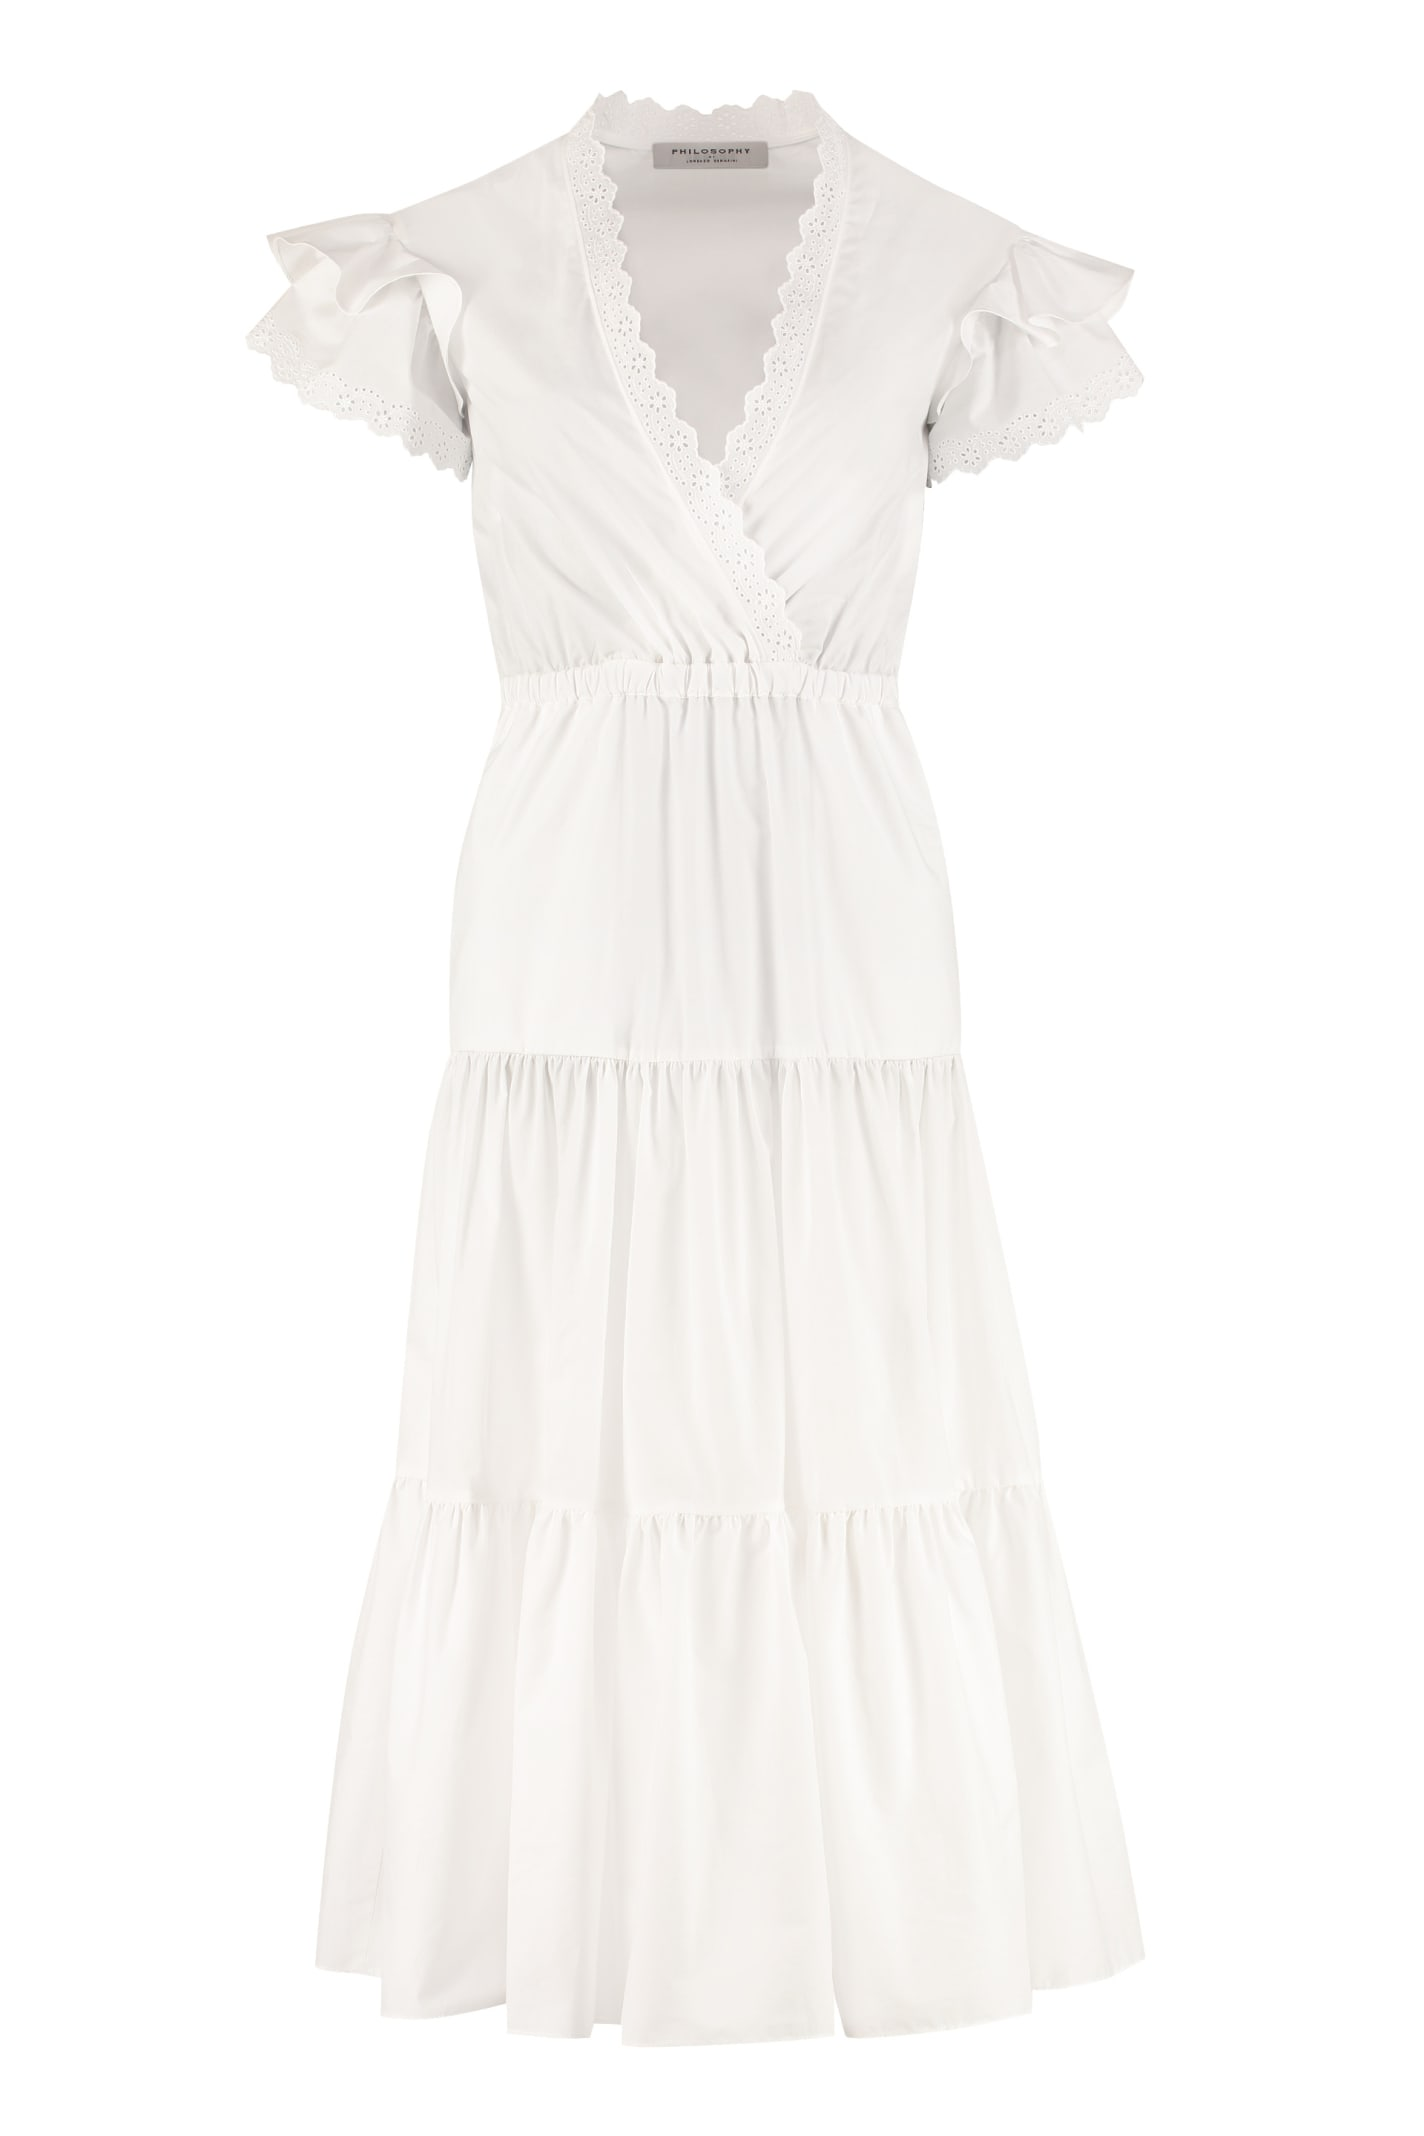 Buy Philosophy di Lorenzo Serafini Cotton Maxi Dress online, shop Philosophy di Lorenzo Serafini with free shipping